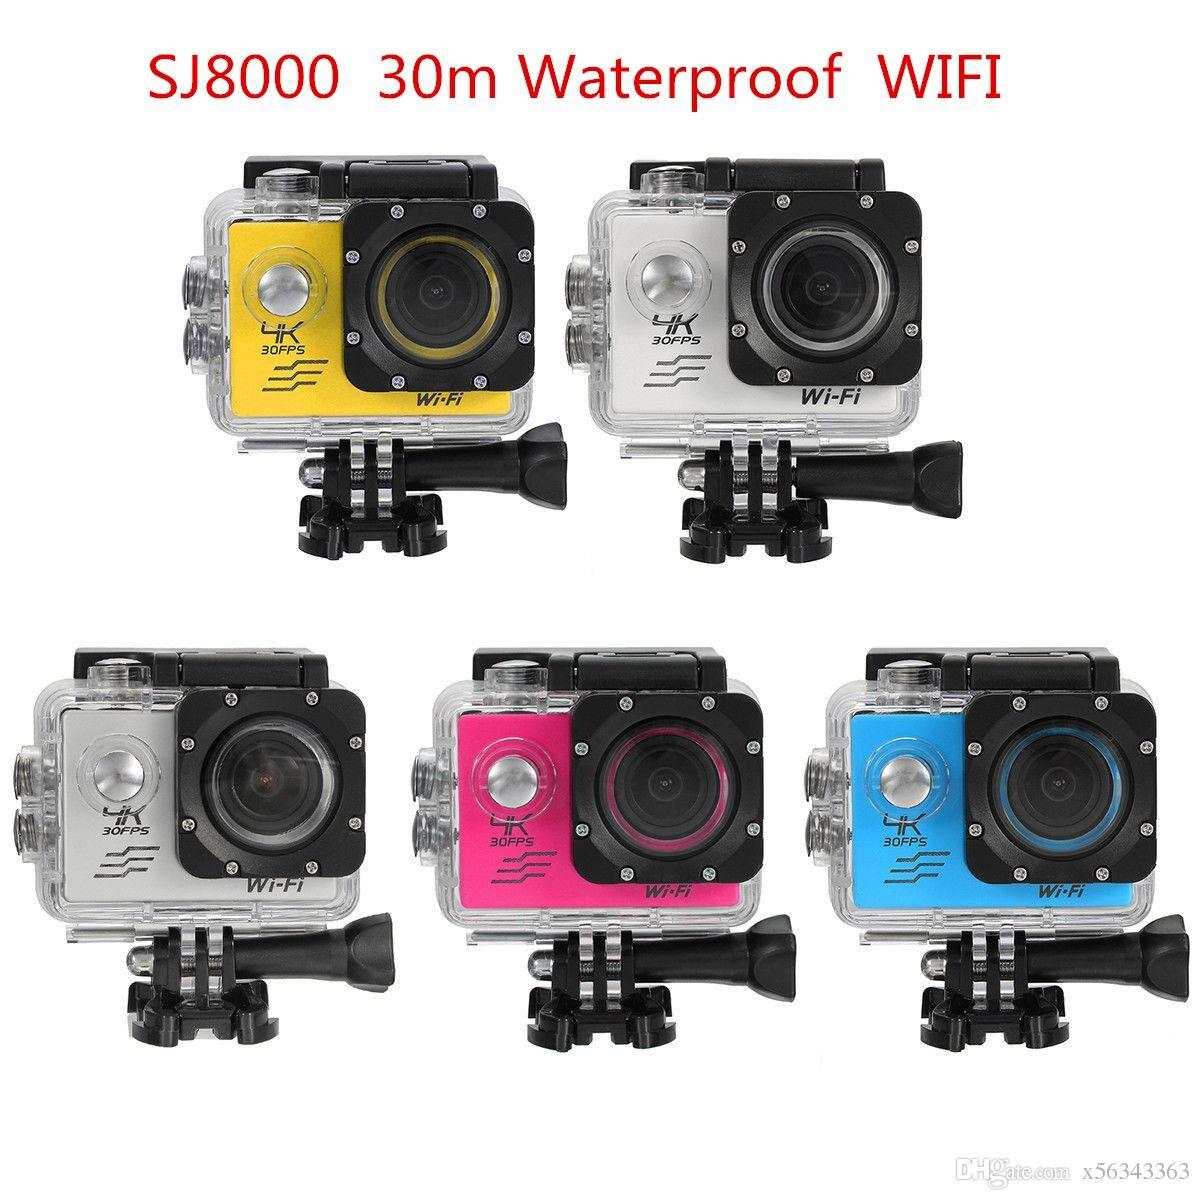 SJ8000 2.0 Inch Sport Action Camera - HD 4K 1080P, Wifi, DV 170 Degree Wide Angle Lens, 30M Waterproof, Remote White - 1